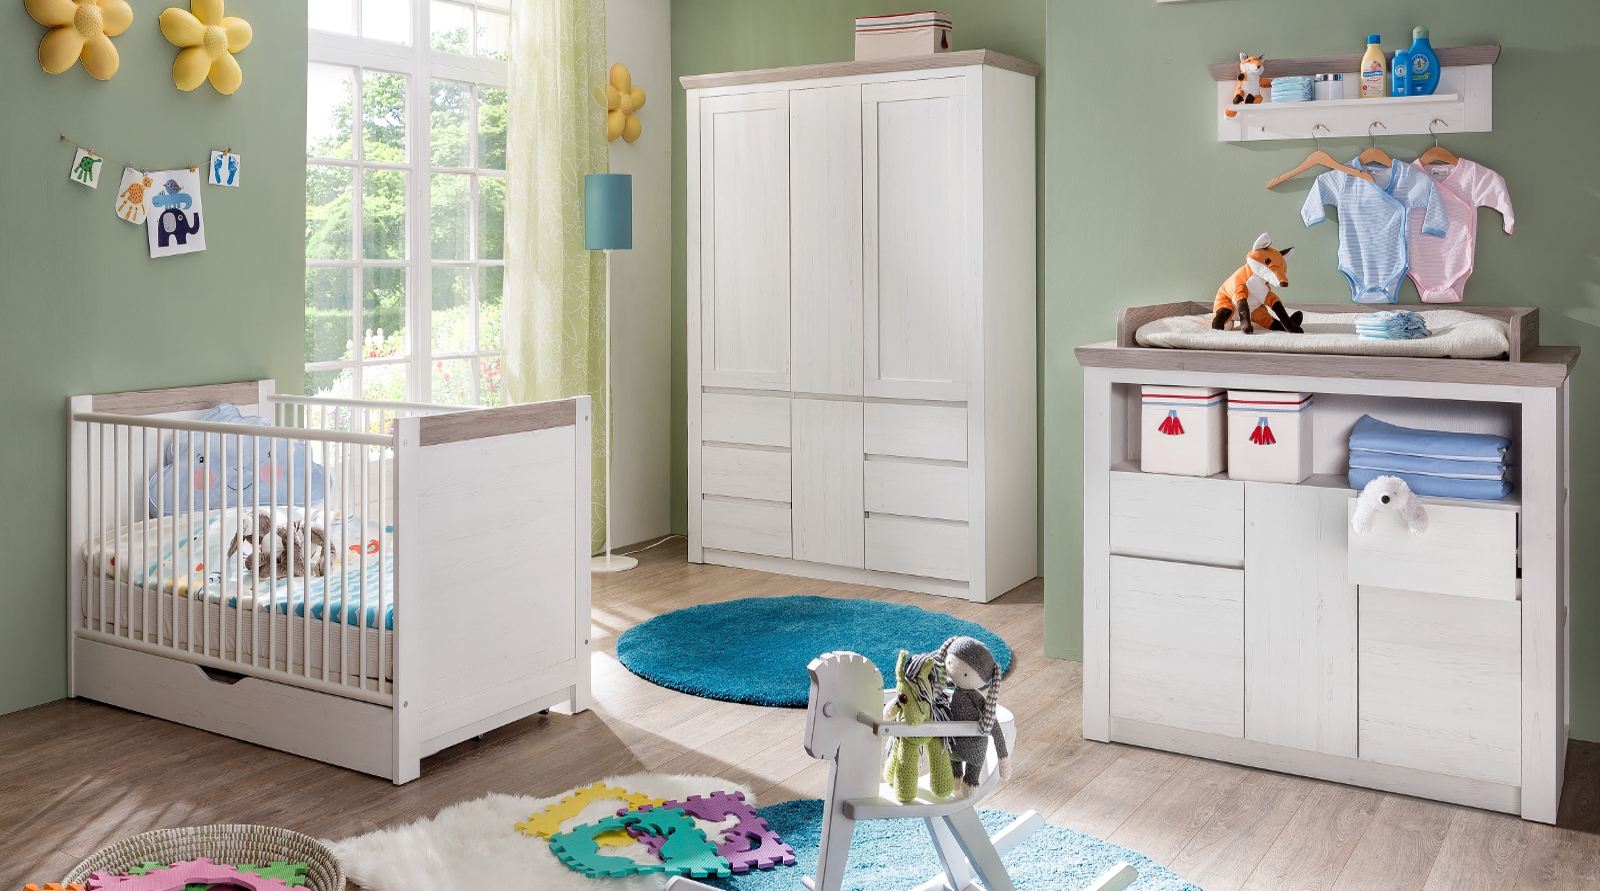 babybett 140x70 gitterbett weiss pinie kinderbett komplett. Black Bedroom Furniture Sets. Home Design Ideas